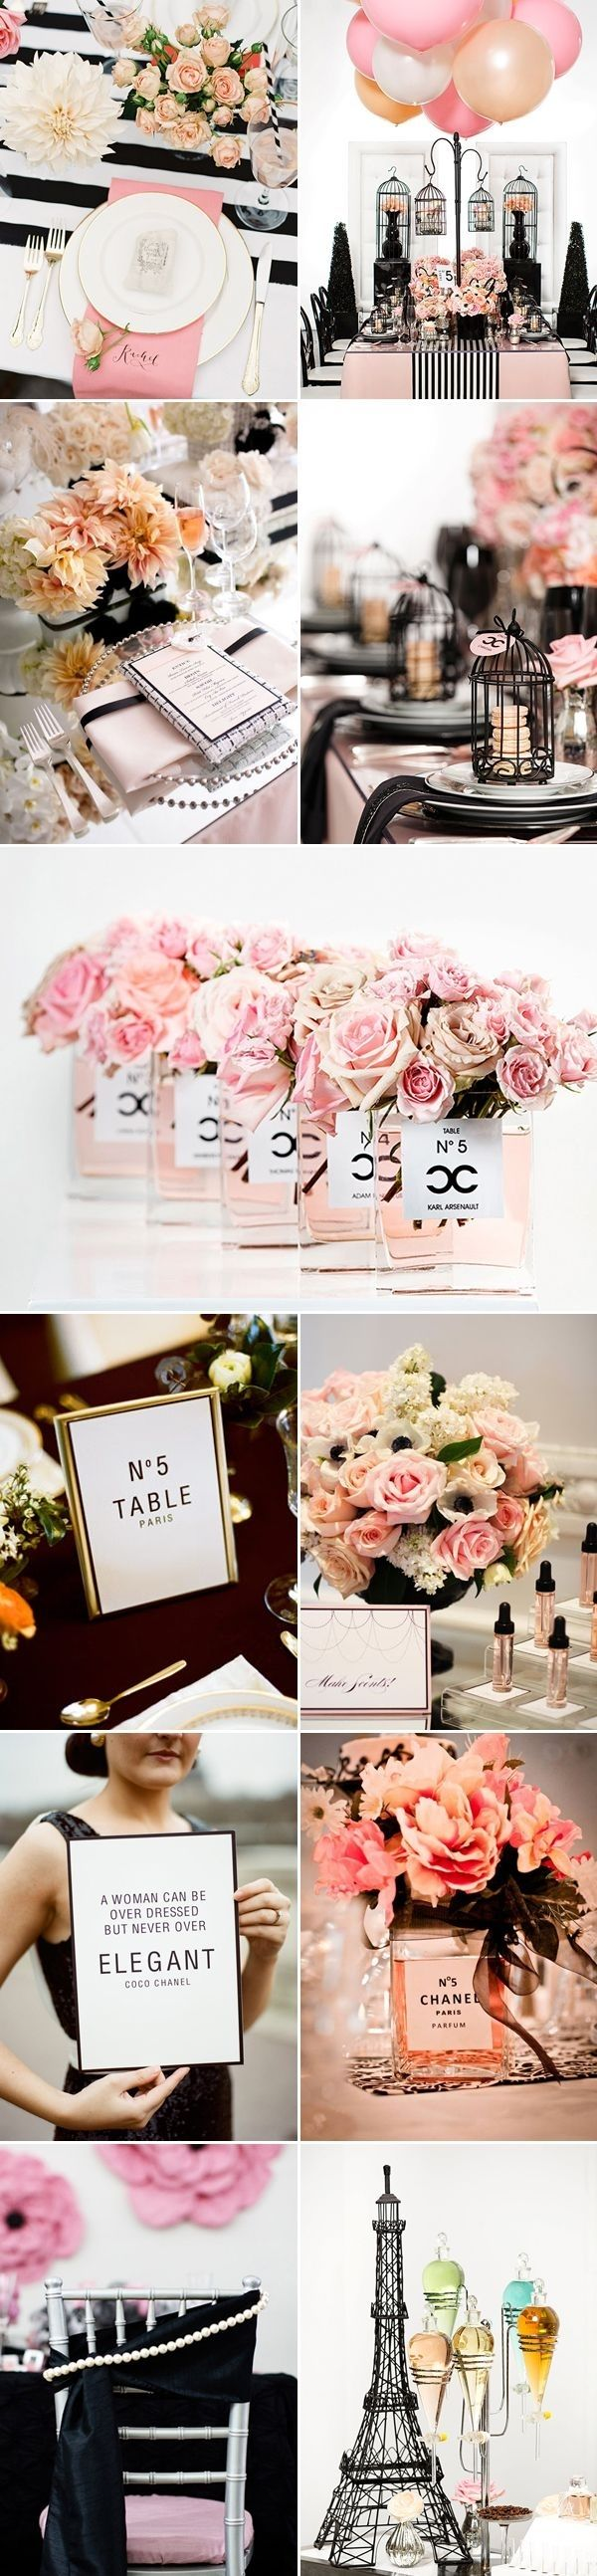 Chanel-Inspired Wedding